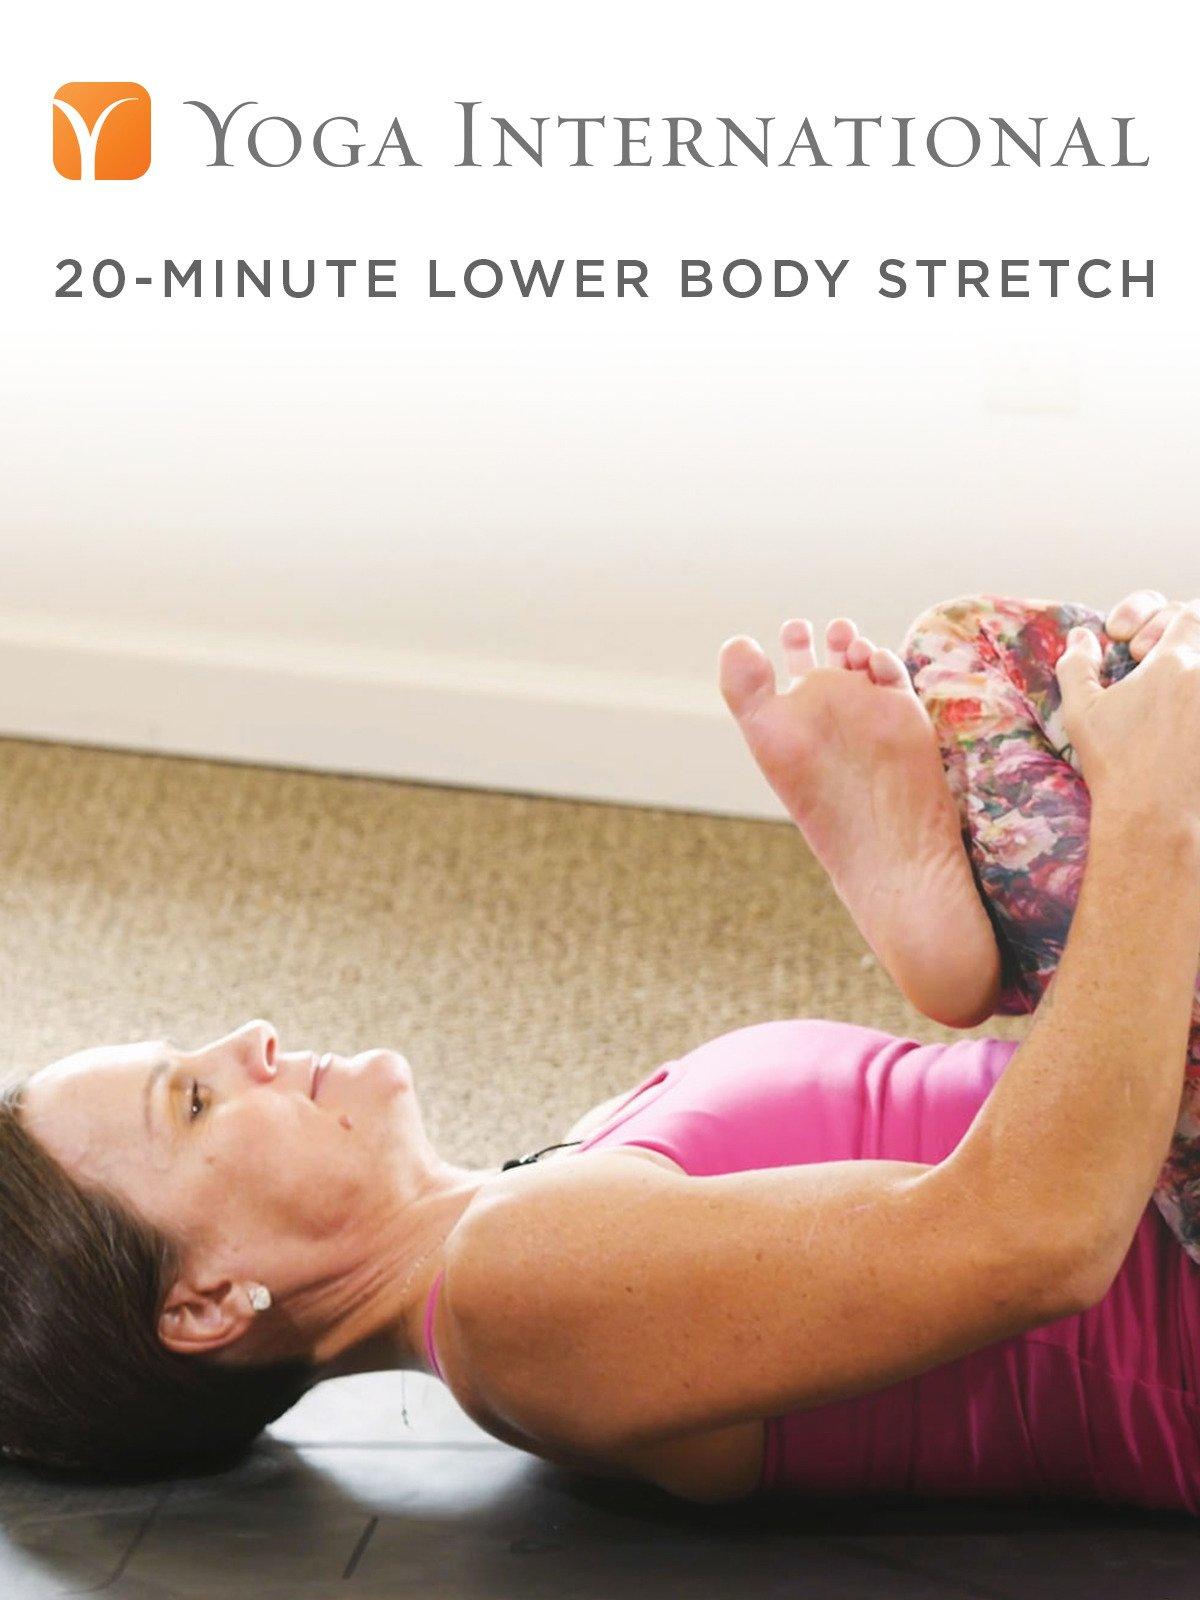 20-Minute Lower Body Stretch